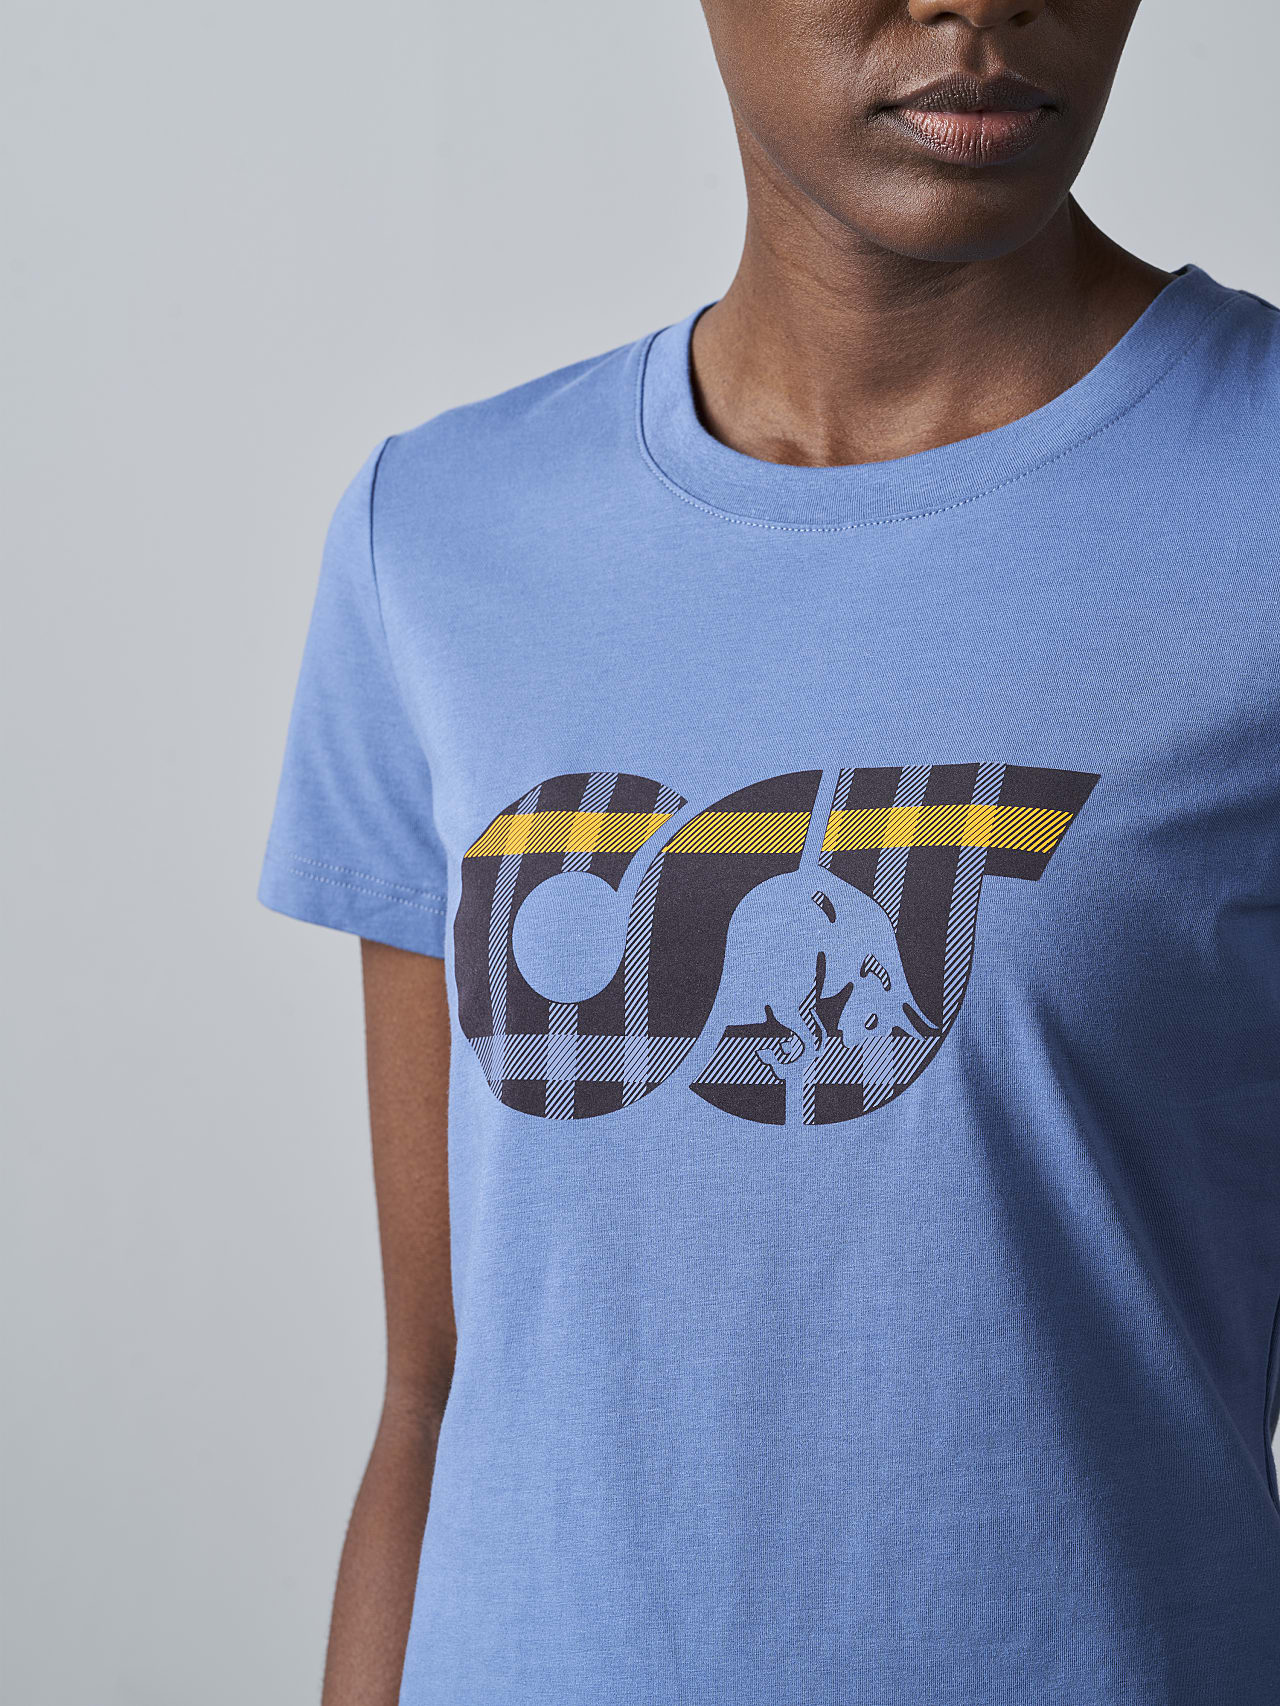 JANPA V1.Y5.02 Logo Print T-Shirt light blue scene7.view.16.name Alpha Tauri